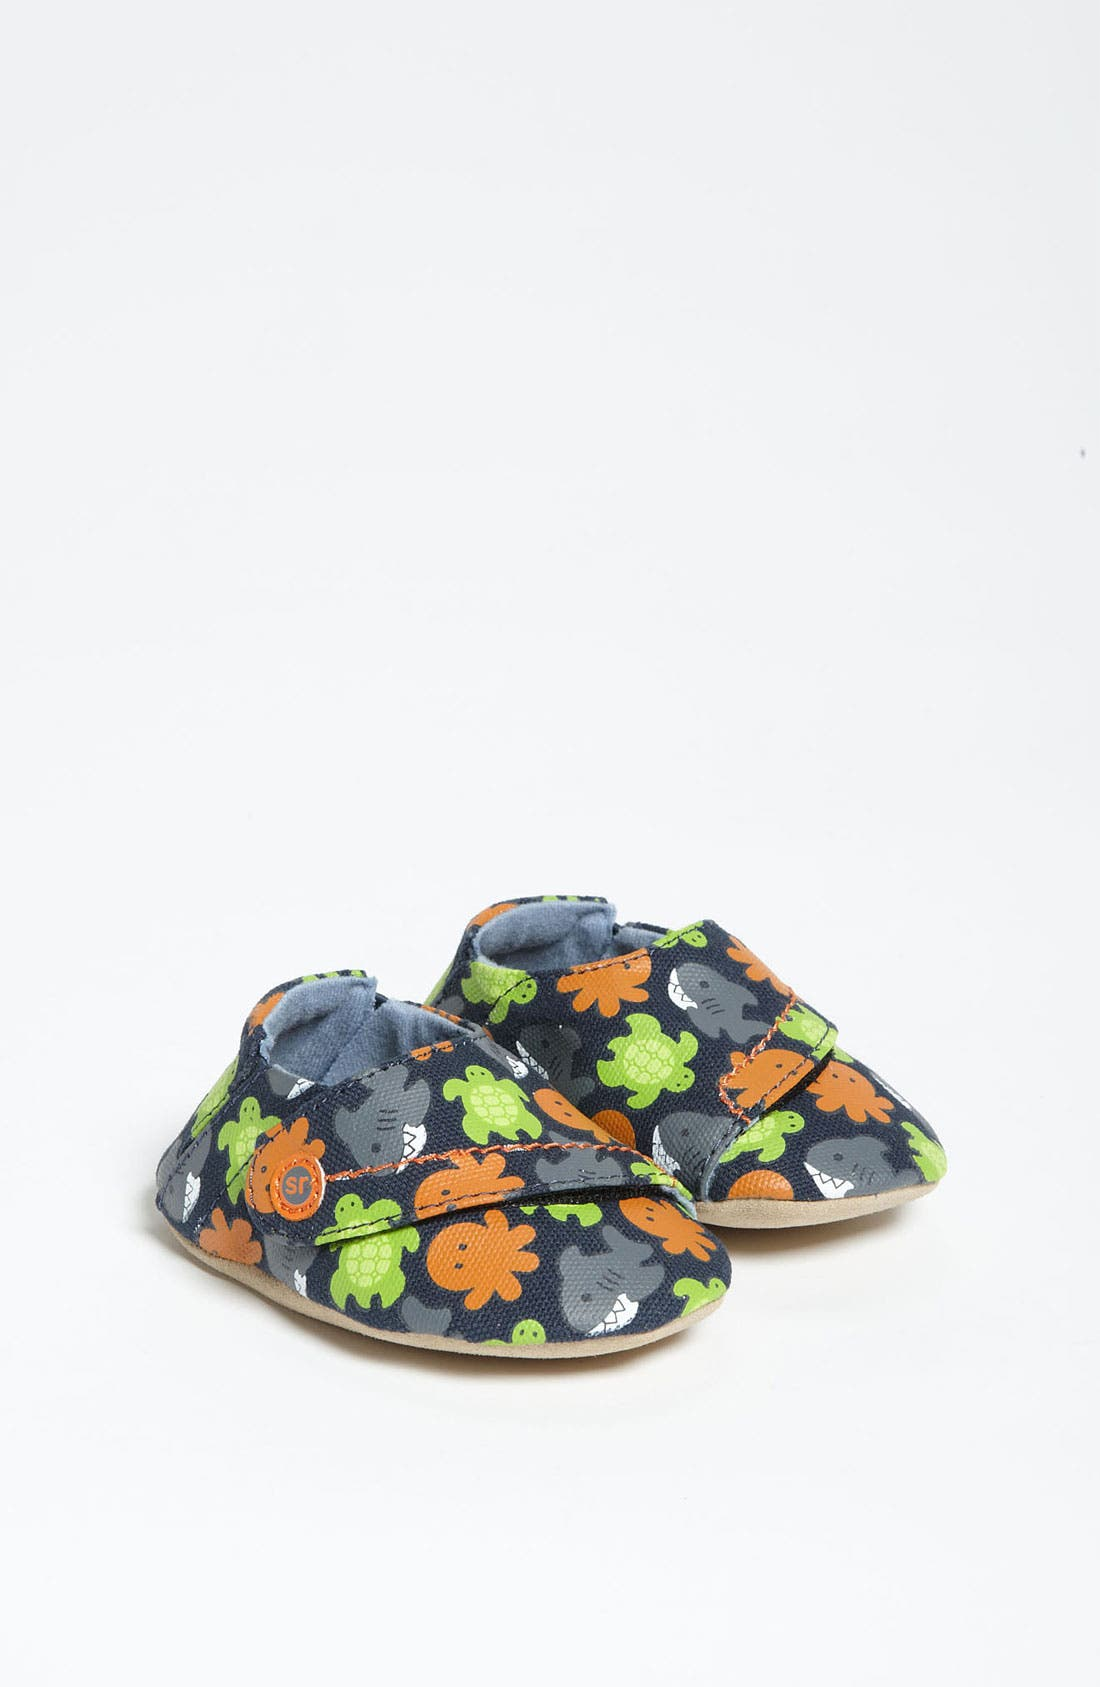 Alternate Image 1 Selected - Stride Rite 'Aqua Adventure' Crib Shoe (Baby)